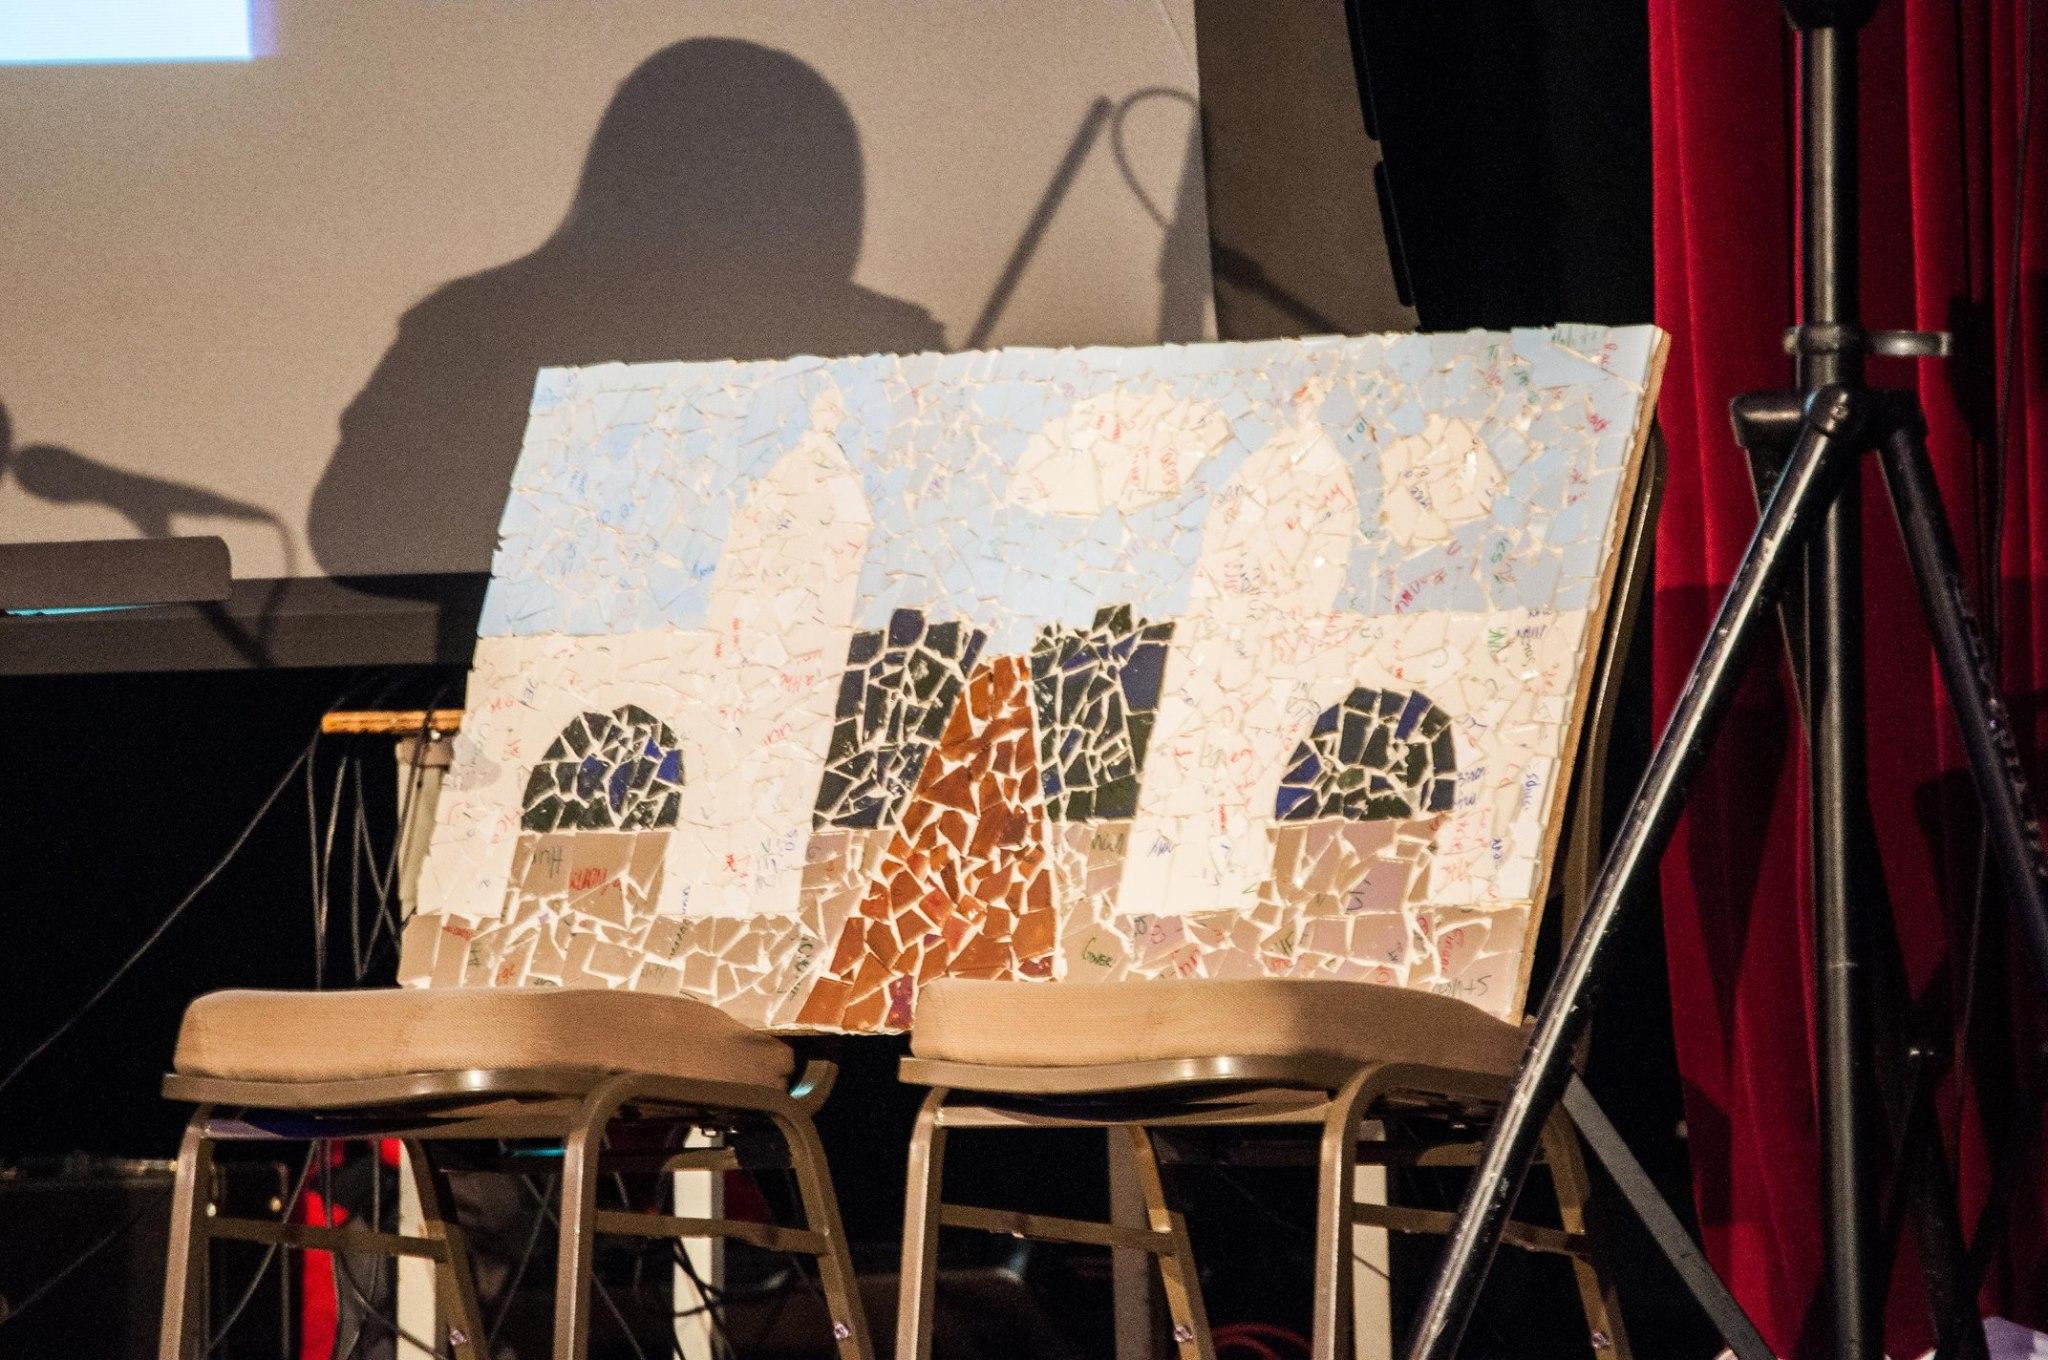 It is Broken mosaic